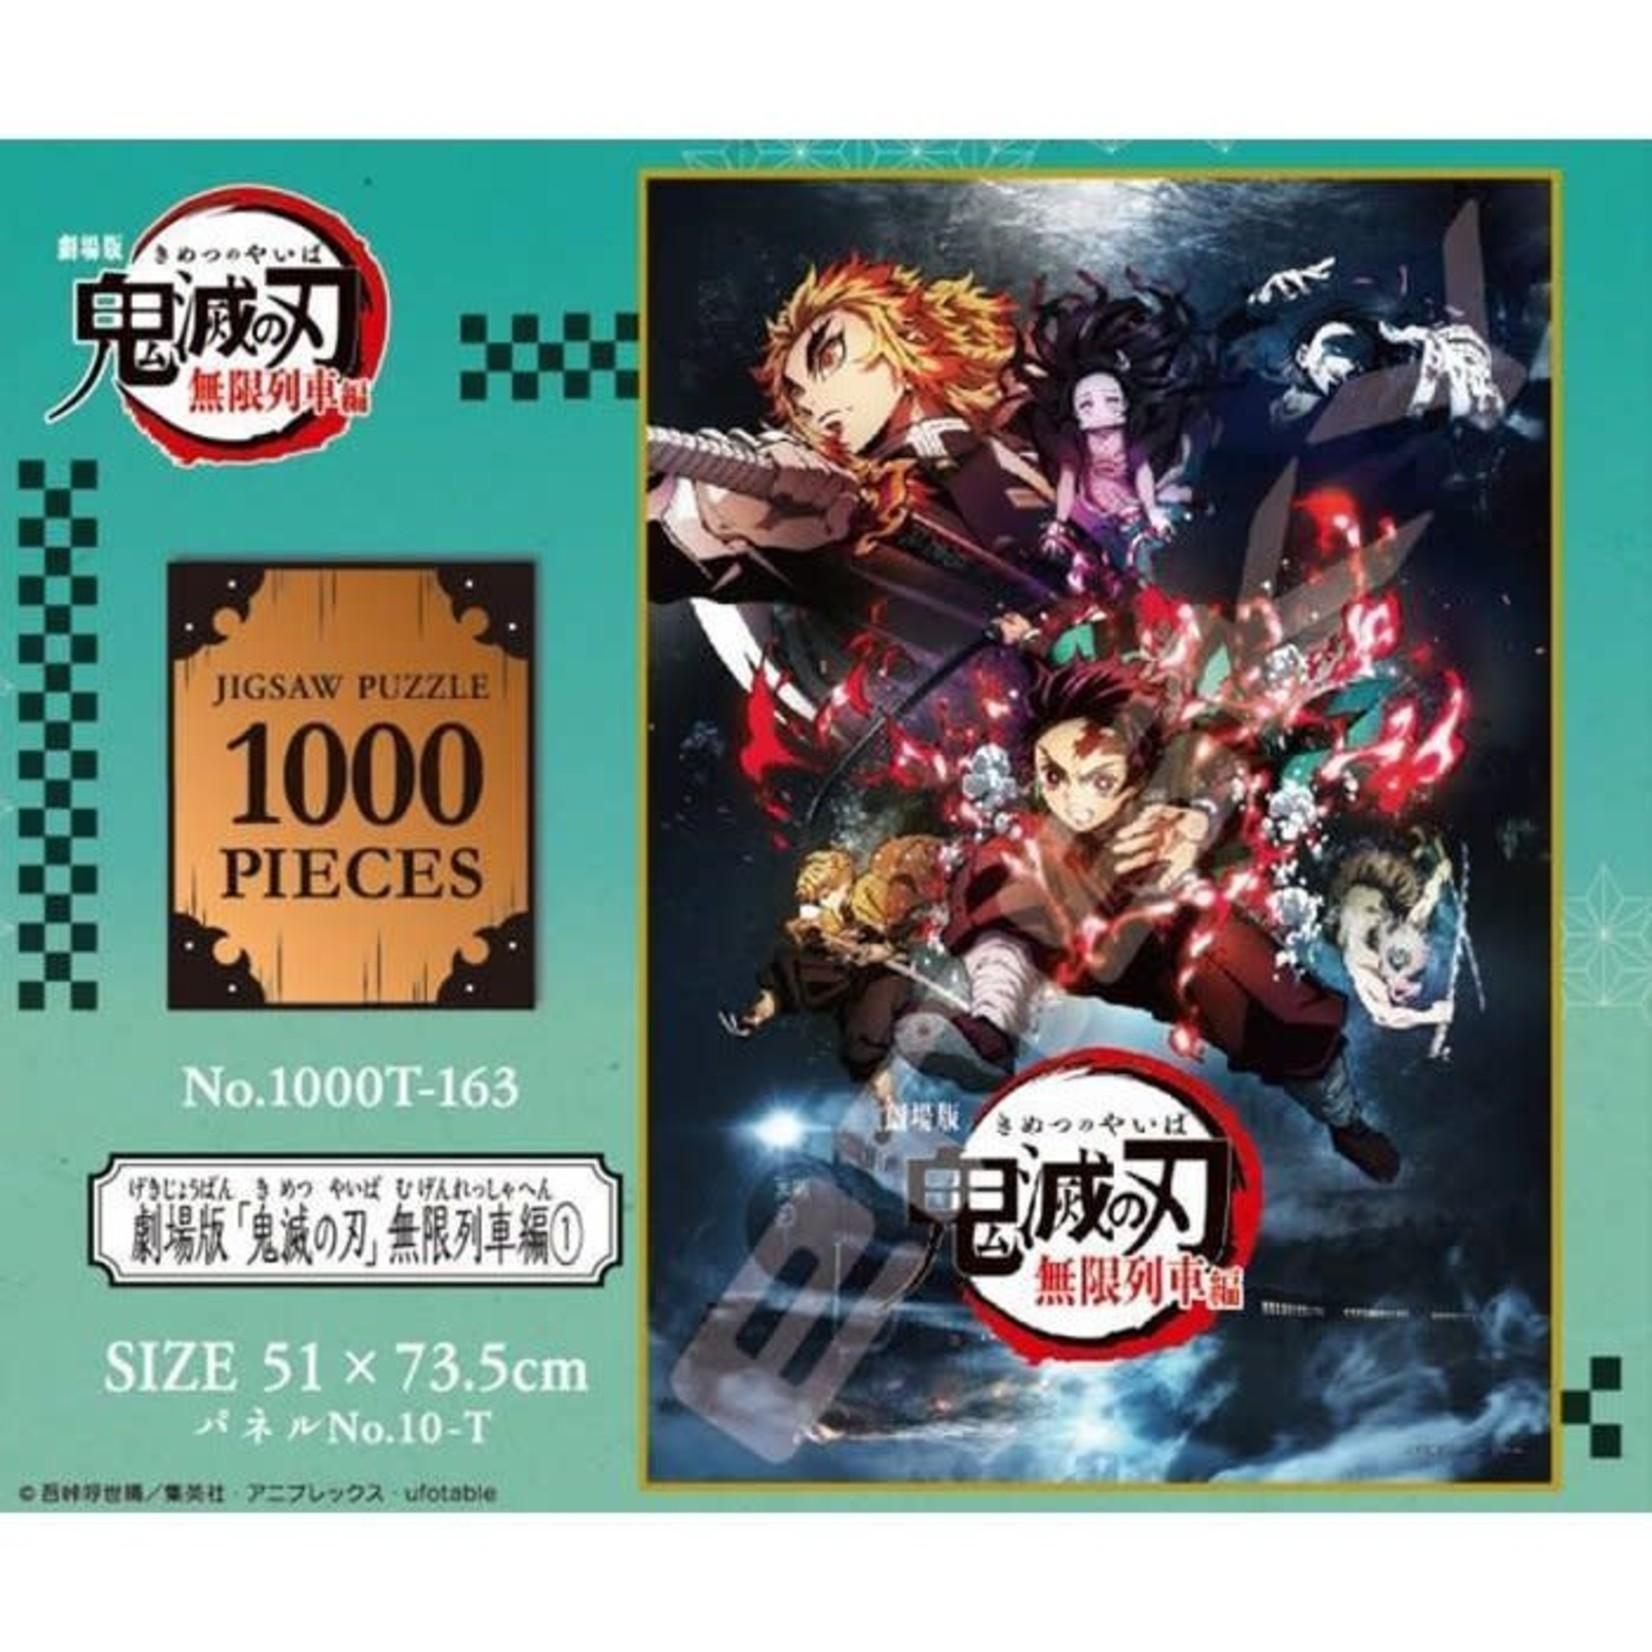 Demon Slayer: Kimetsu no Yaiba the Movie: Mugen Train 1000pcs puzzle